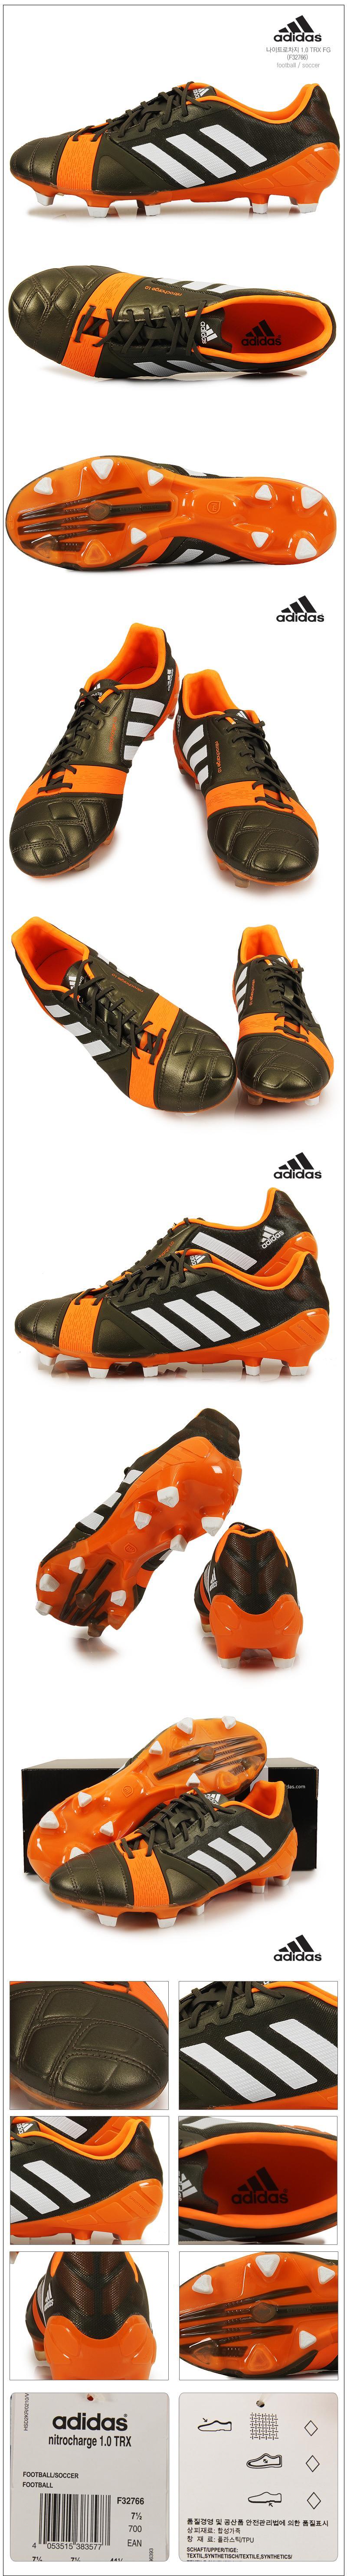 20050610\adidas-F32766-800.jpg